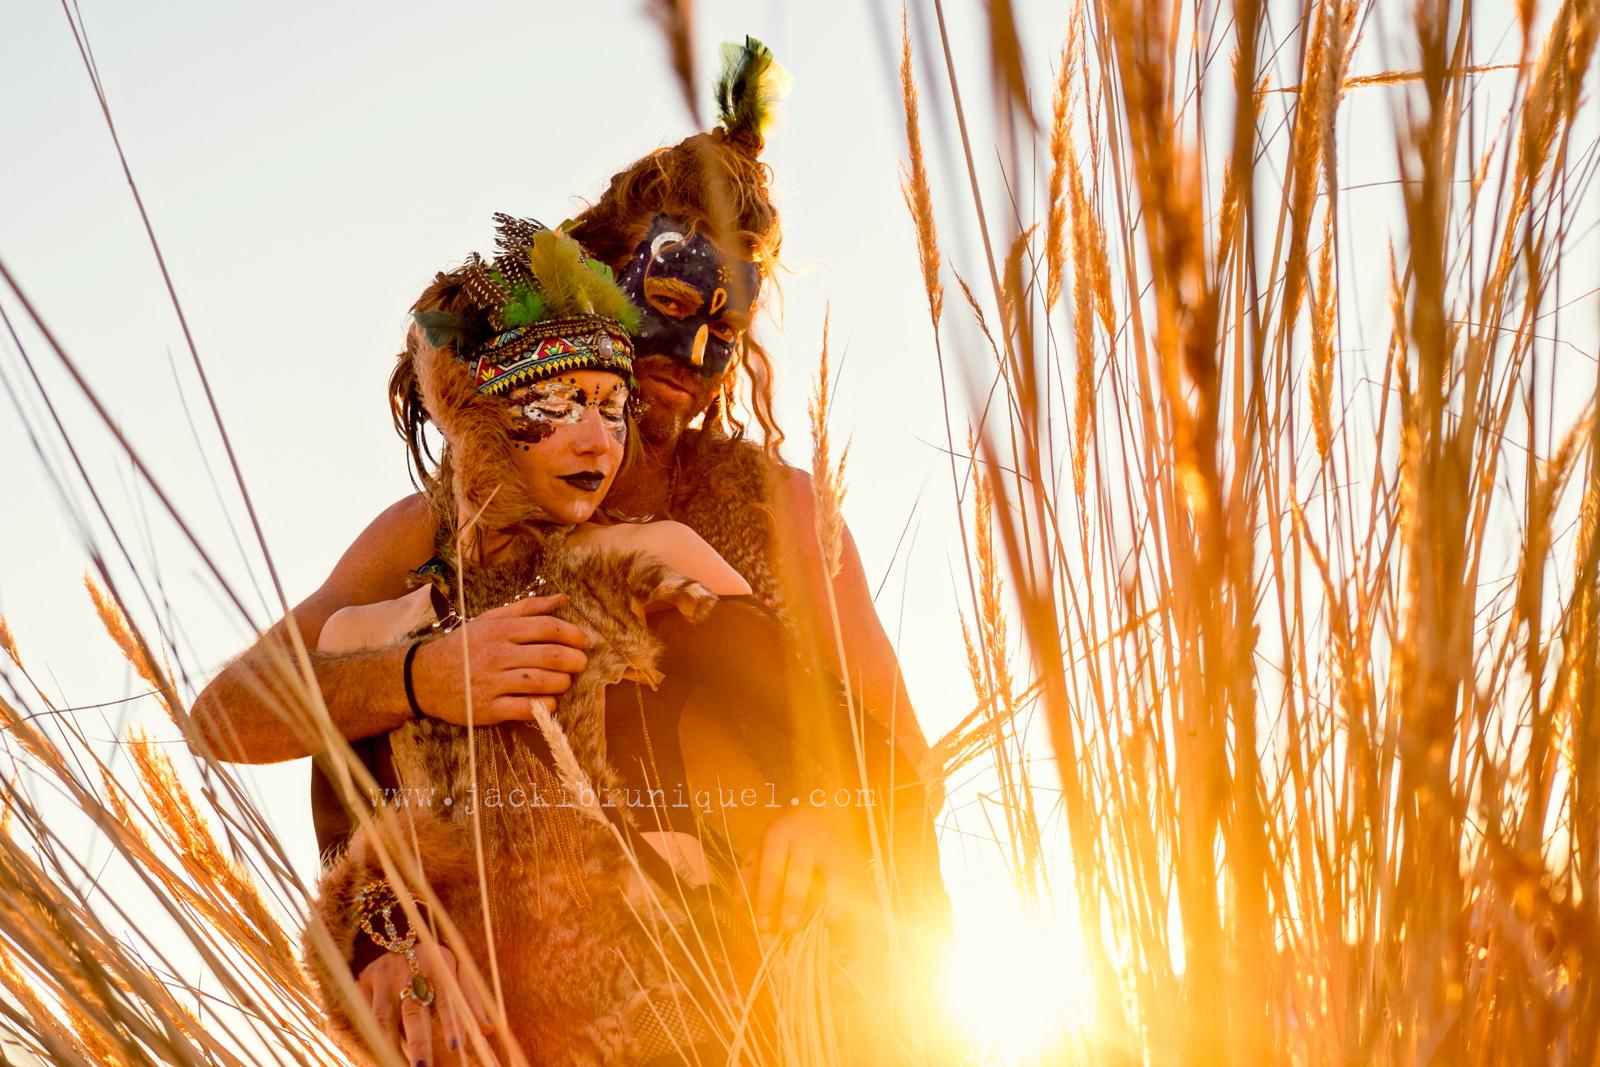 Afrika-Burn-2016-Creative-South-African-Photographer-Jacki-Bruniquel-013.jpg